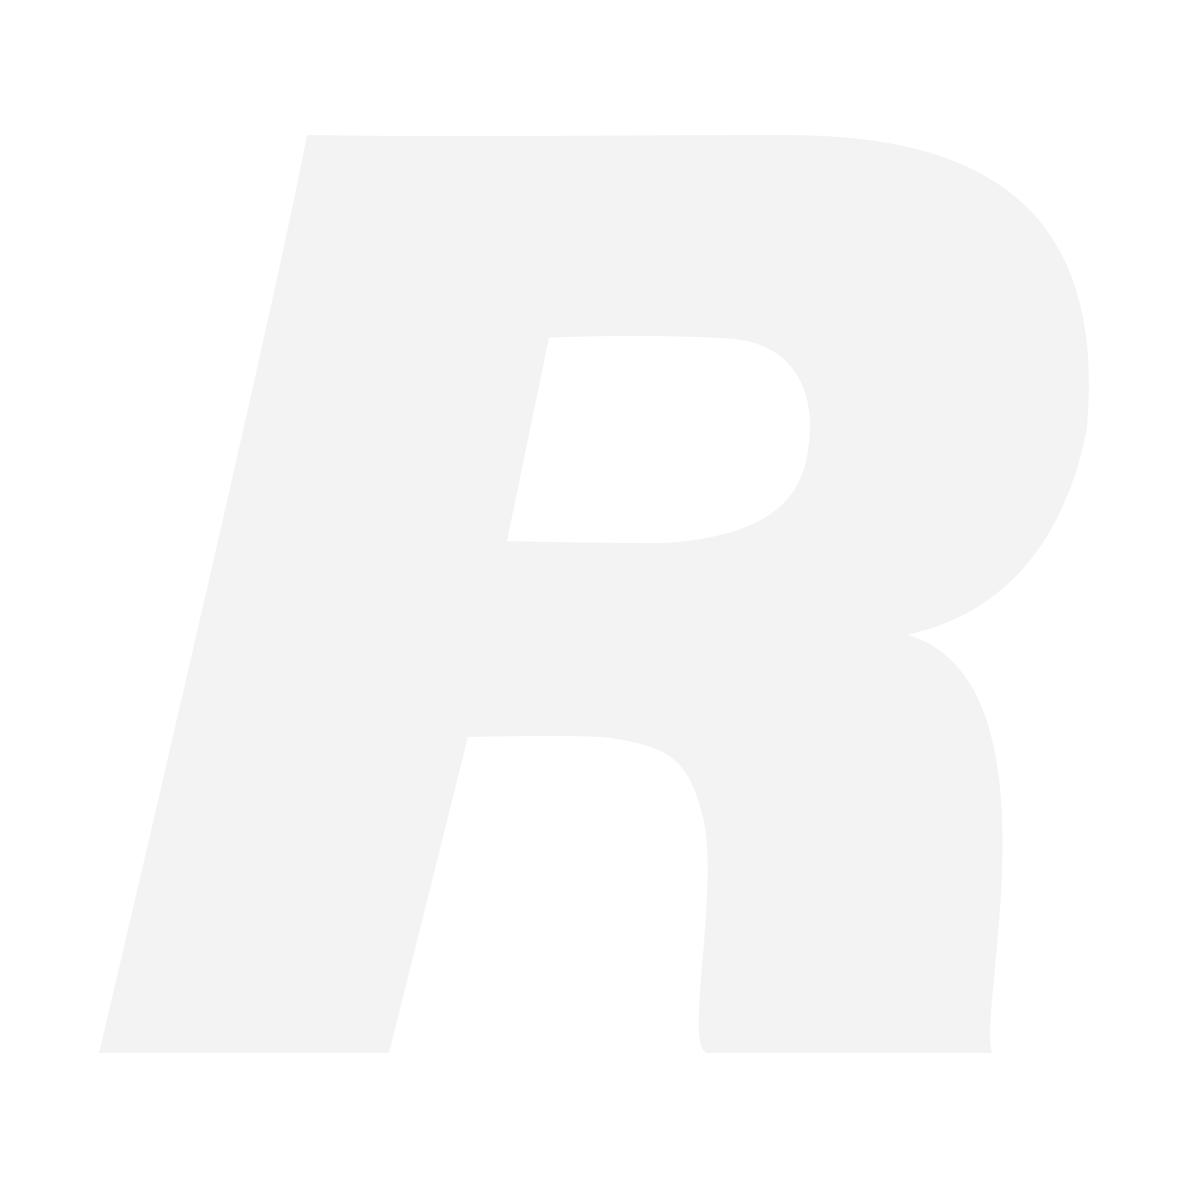 NIKON HR-2 vastavalosuoja (AF 50/1.8)